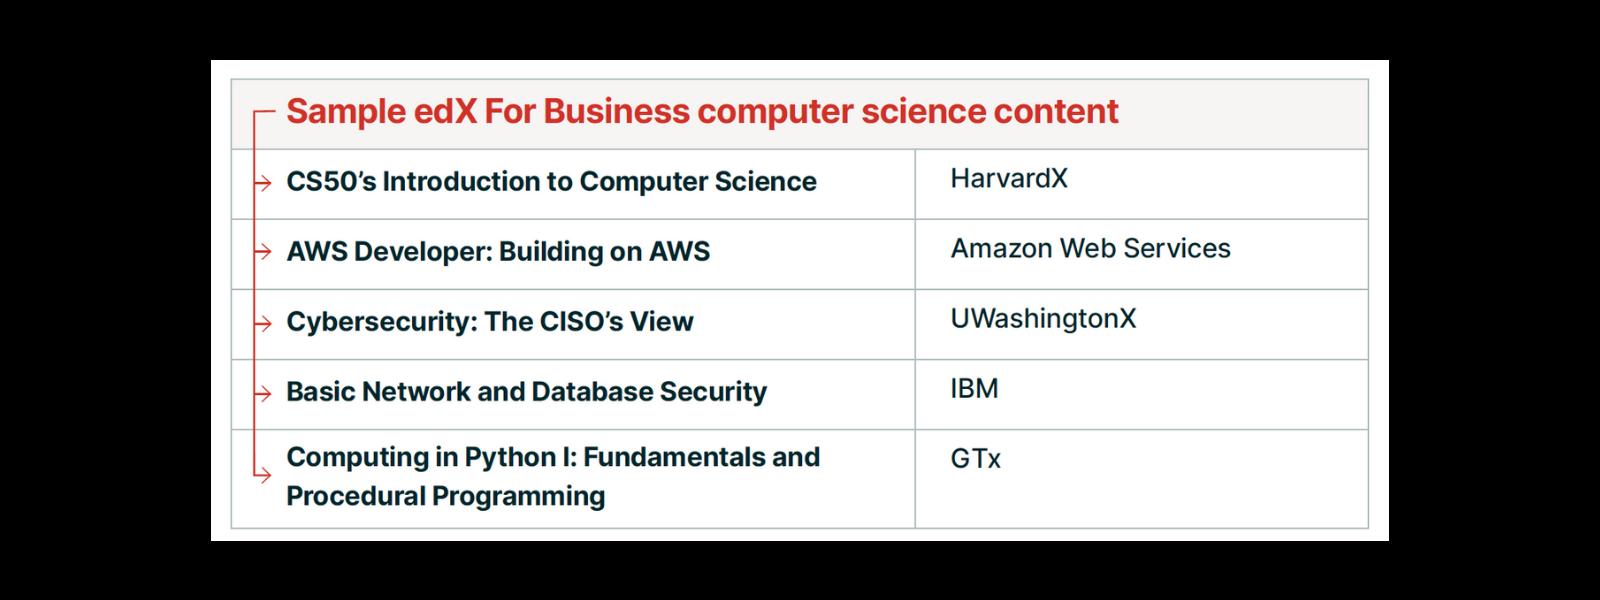 edx-computer-science-courses